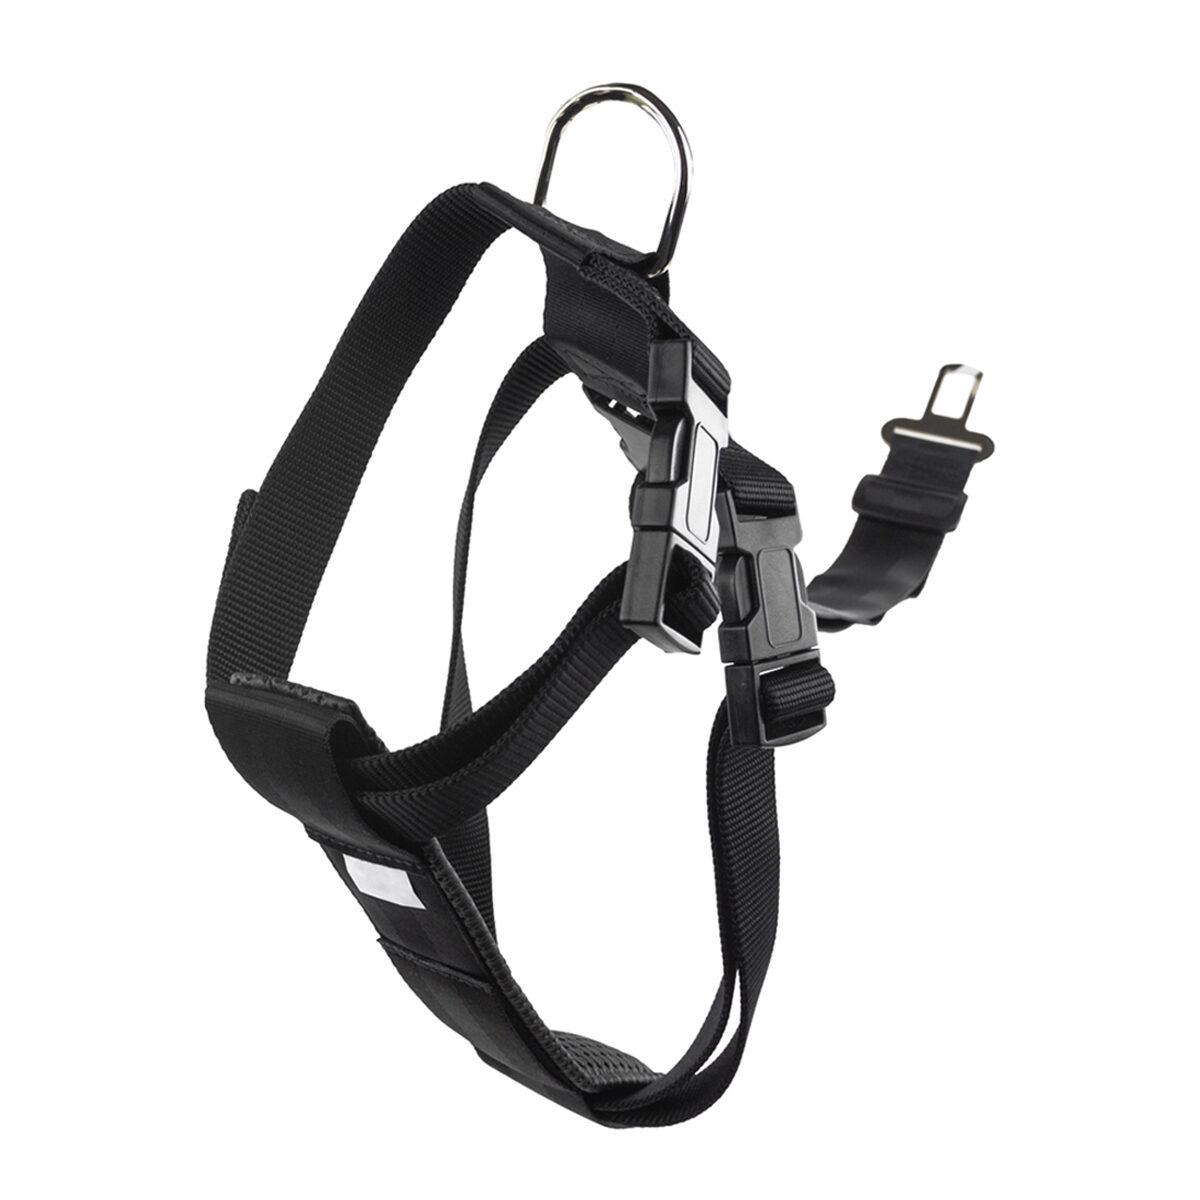 Veiligheidstuig Nylon 25mm Hondentuigje 60x80cm Zwart